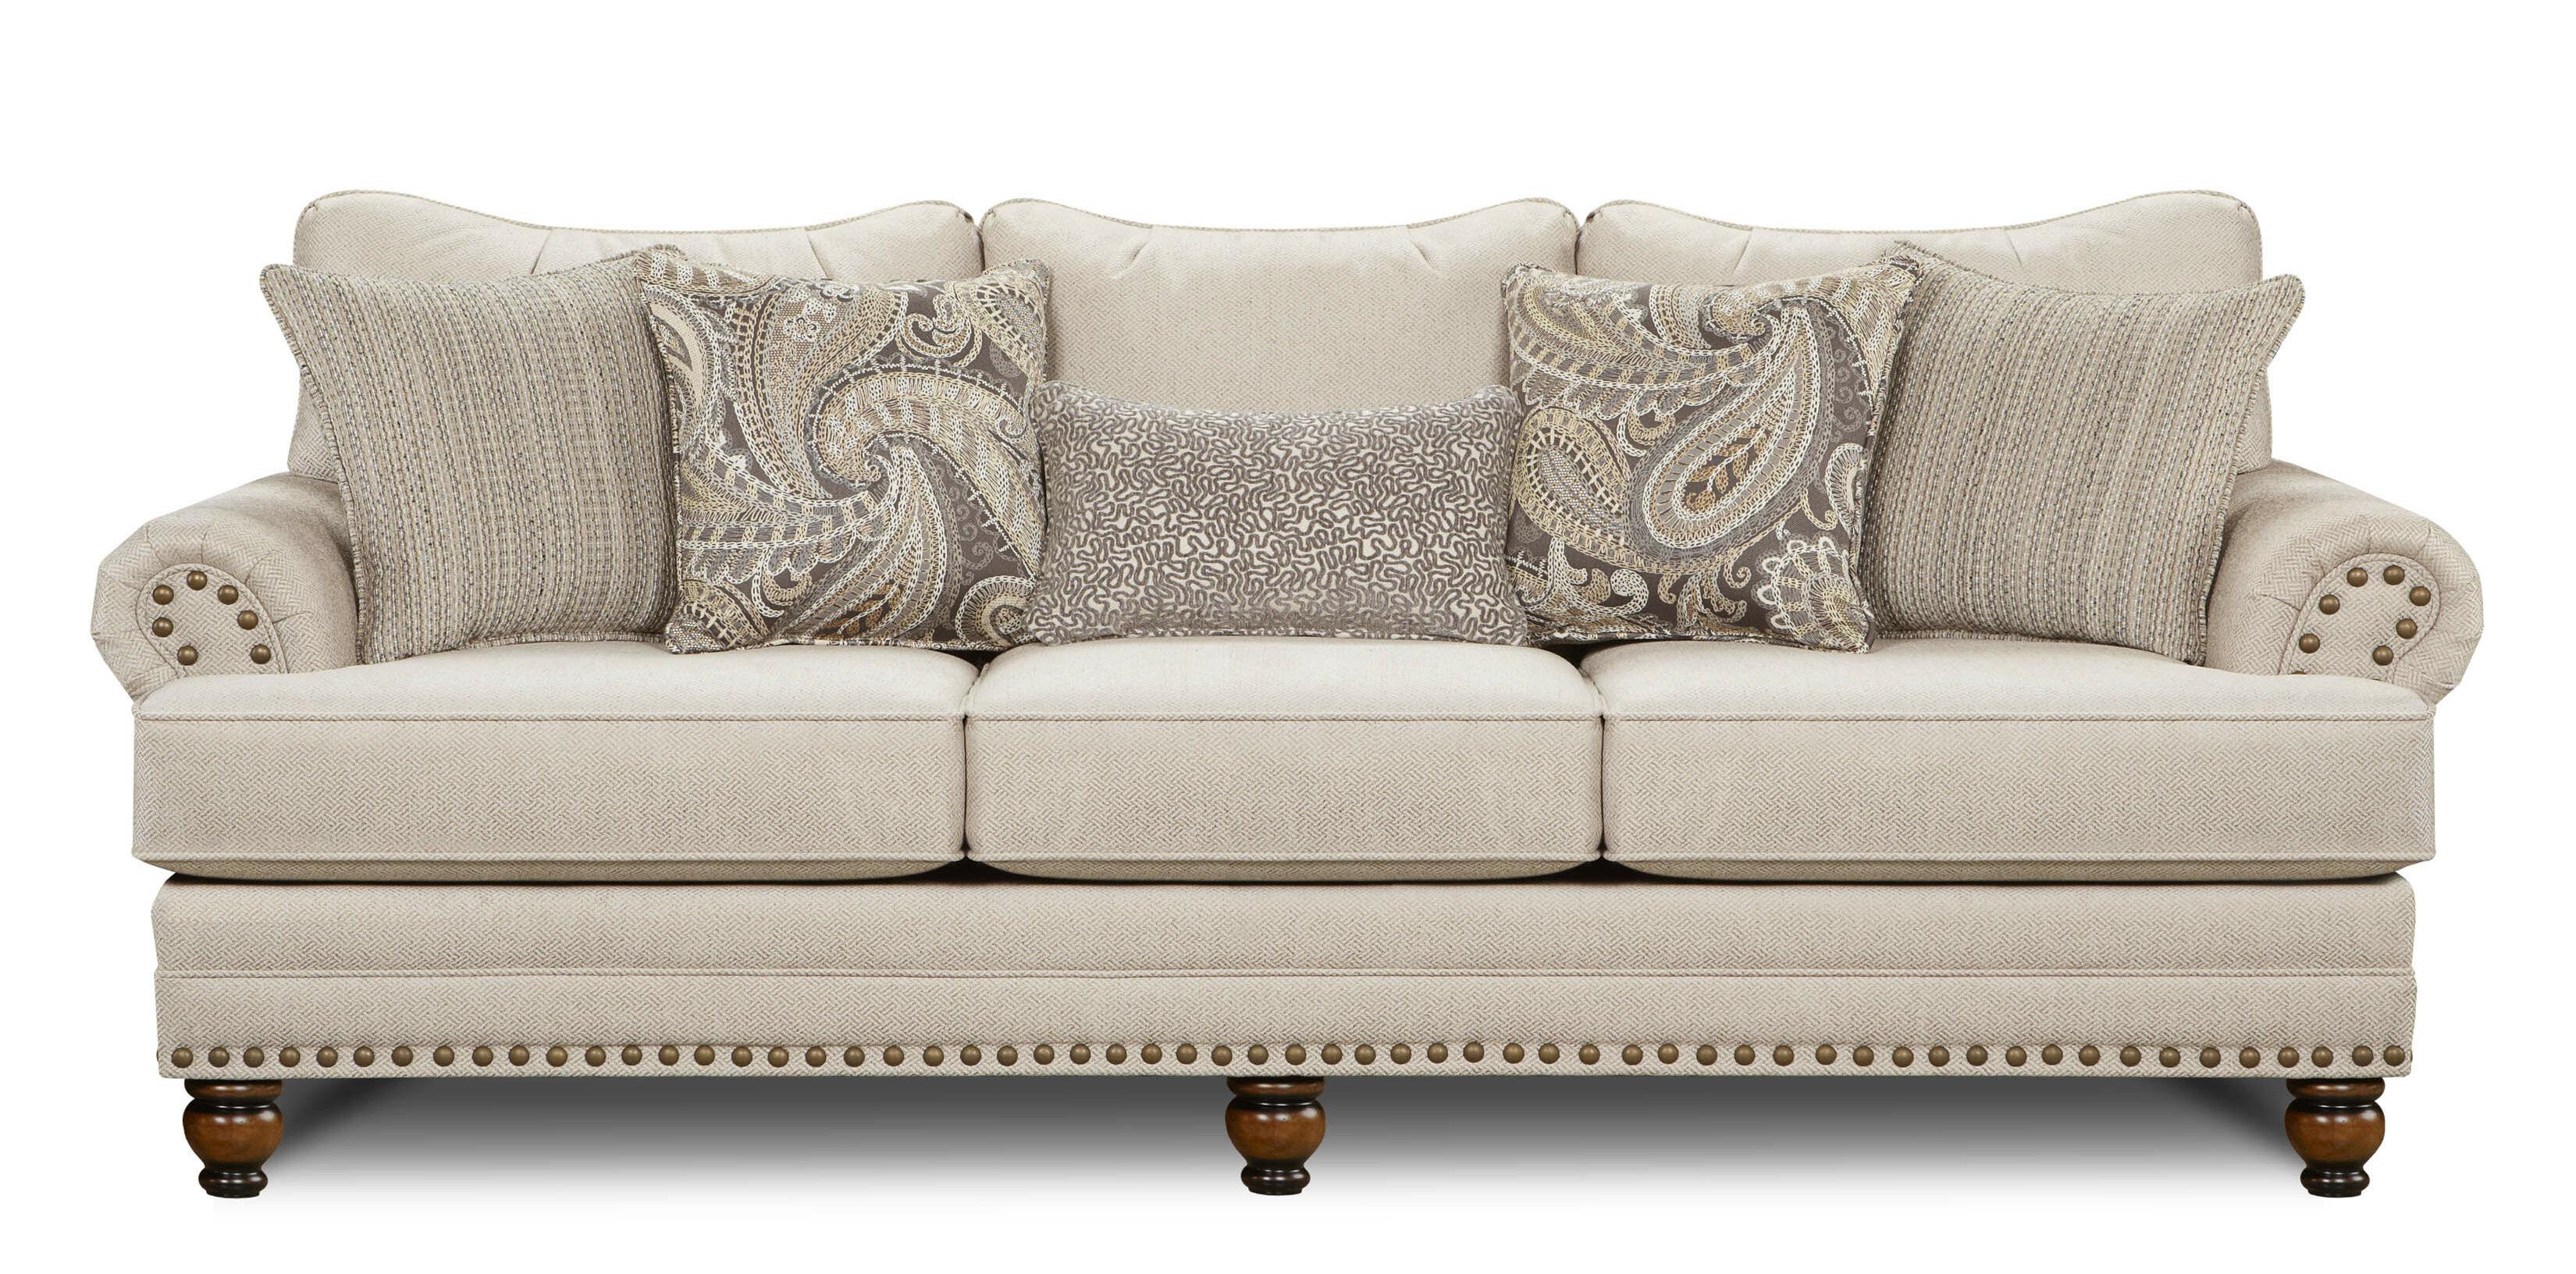 Three Posts Lavine 96 Rolled Arm Sofa Reviews Wayfair